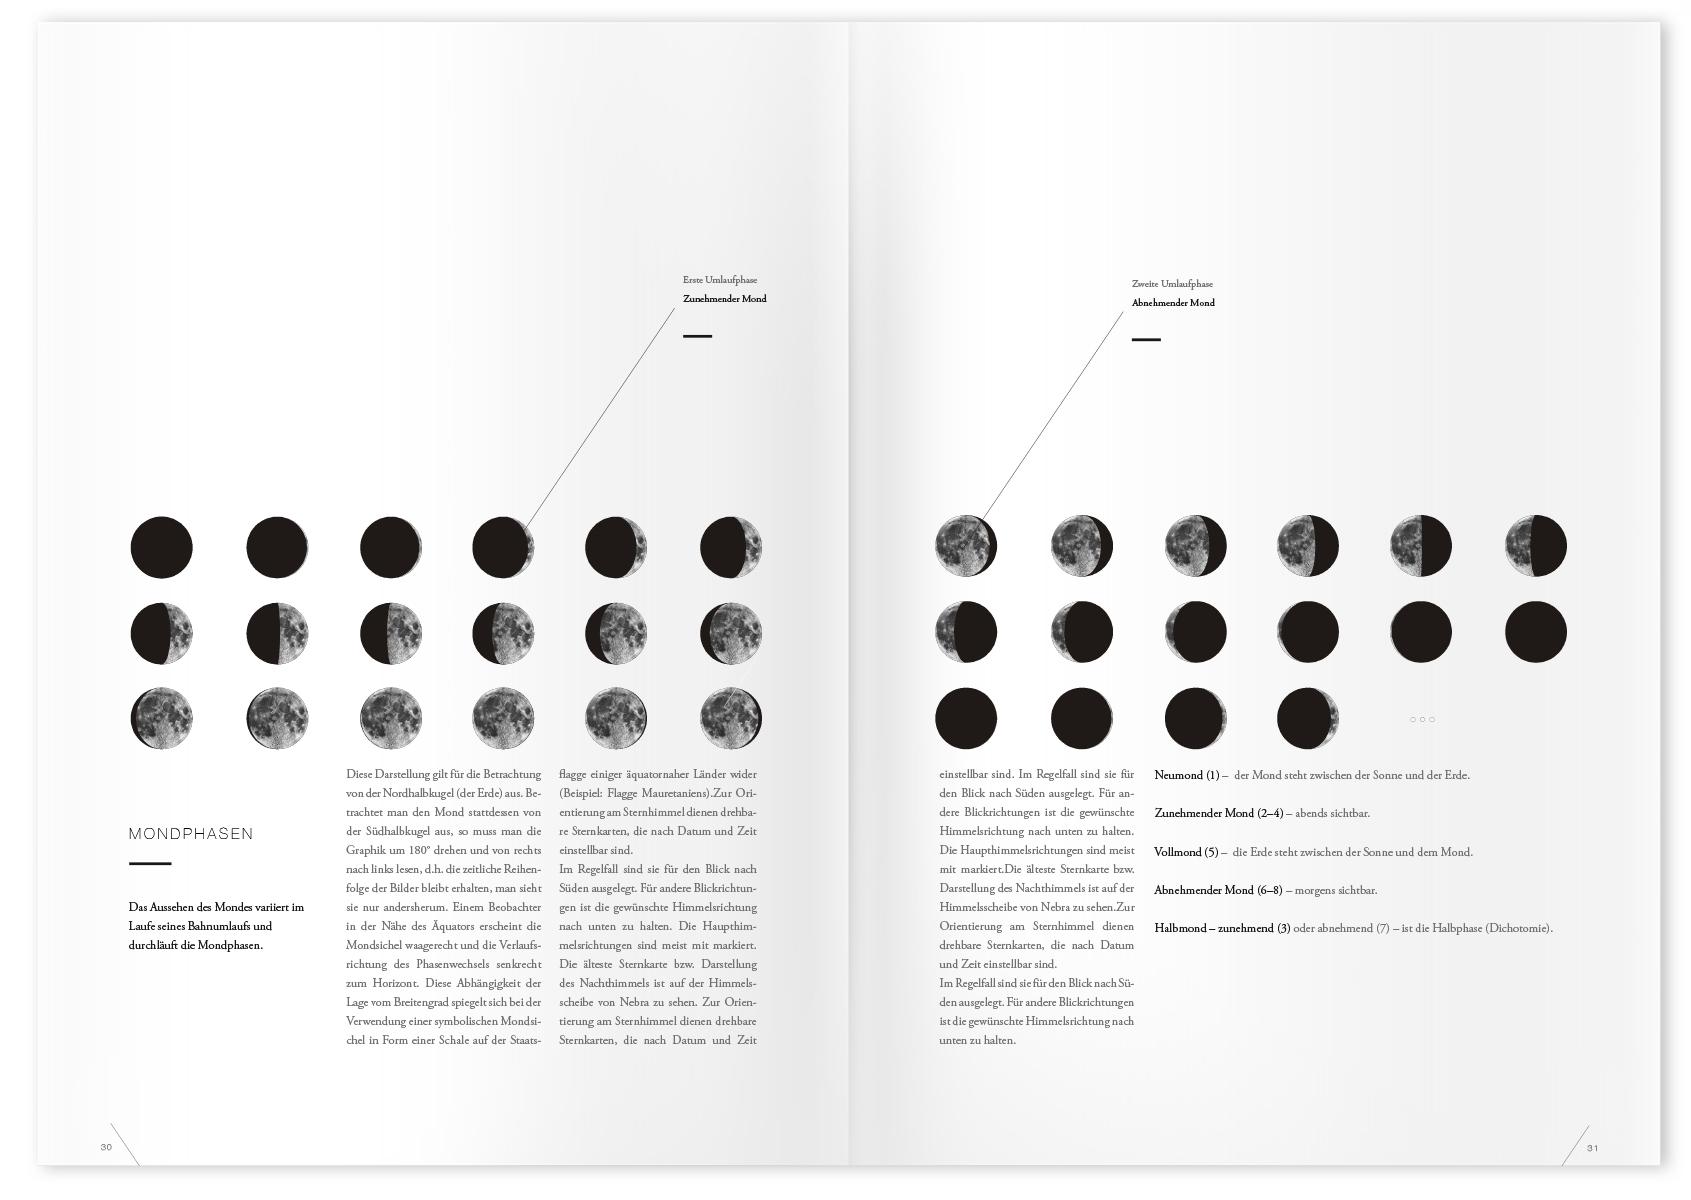 06_Cosmos-Magazin_hsrm-Hochschule-RheinMain_Editorial-Design_Grafikdesign_Gloria-Kison.jpg